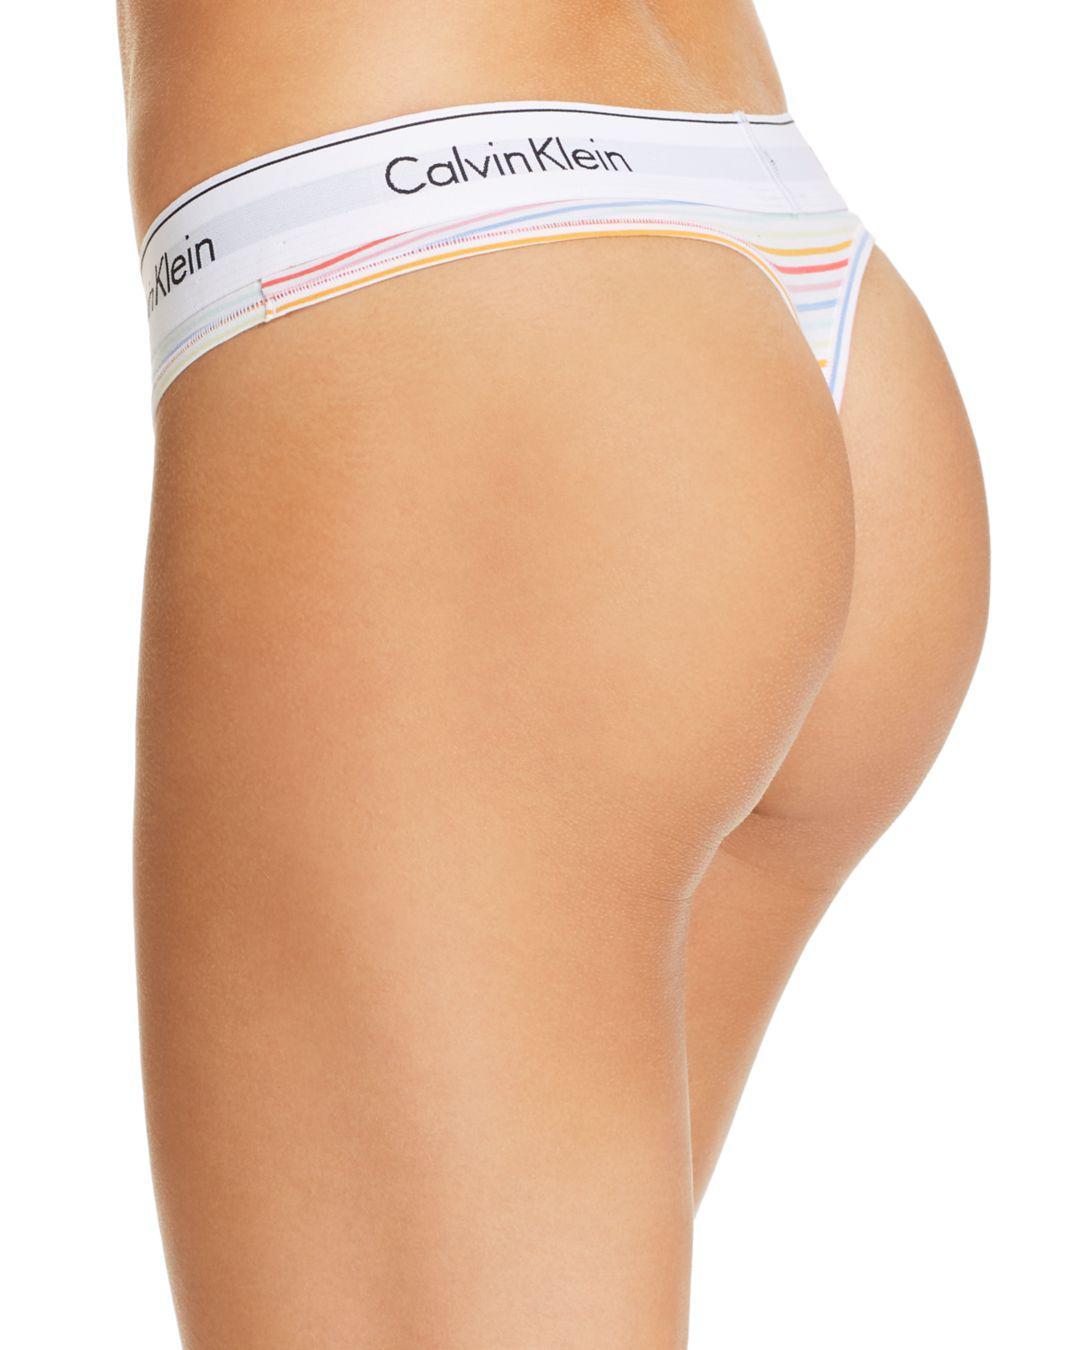 2c900659d4fe86 Calvin Klein Modern Cotton Pride Thong in White - Lyst